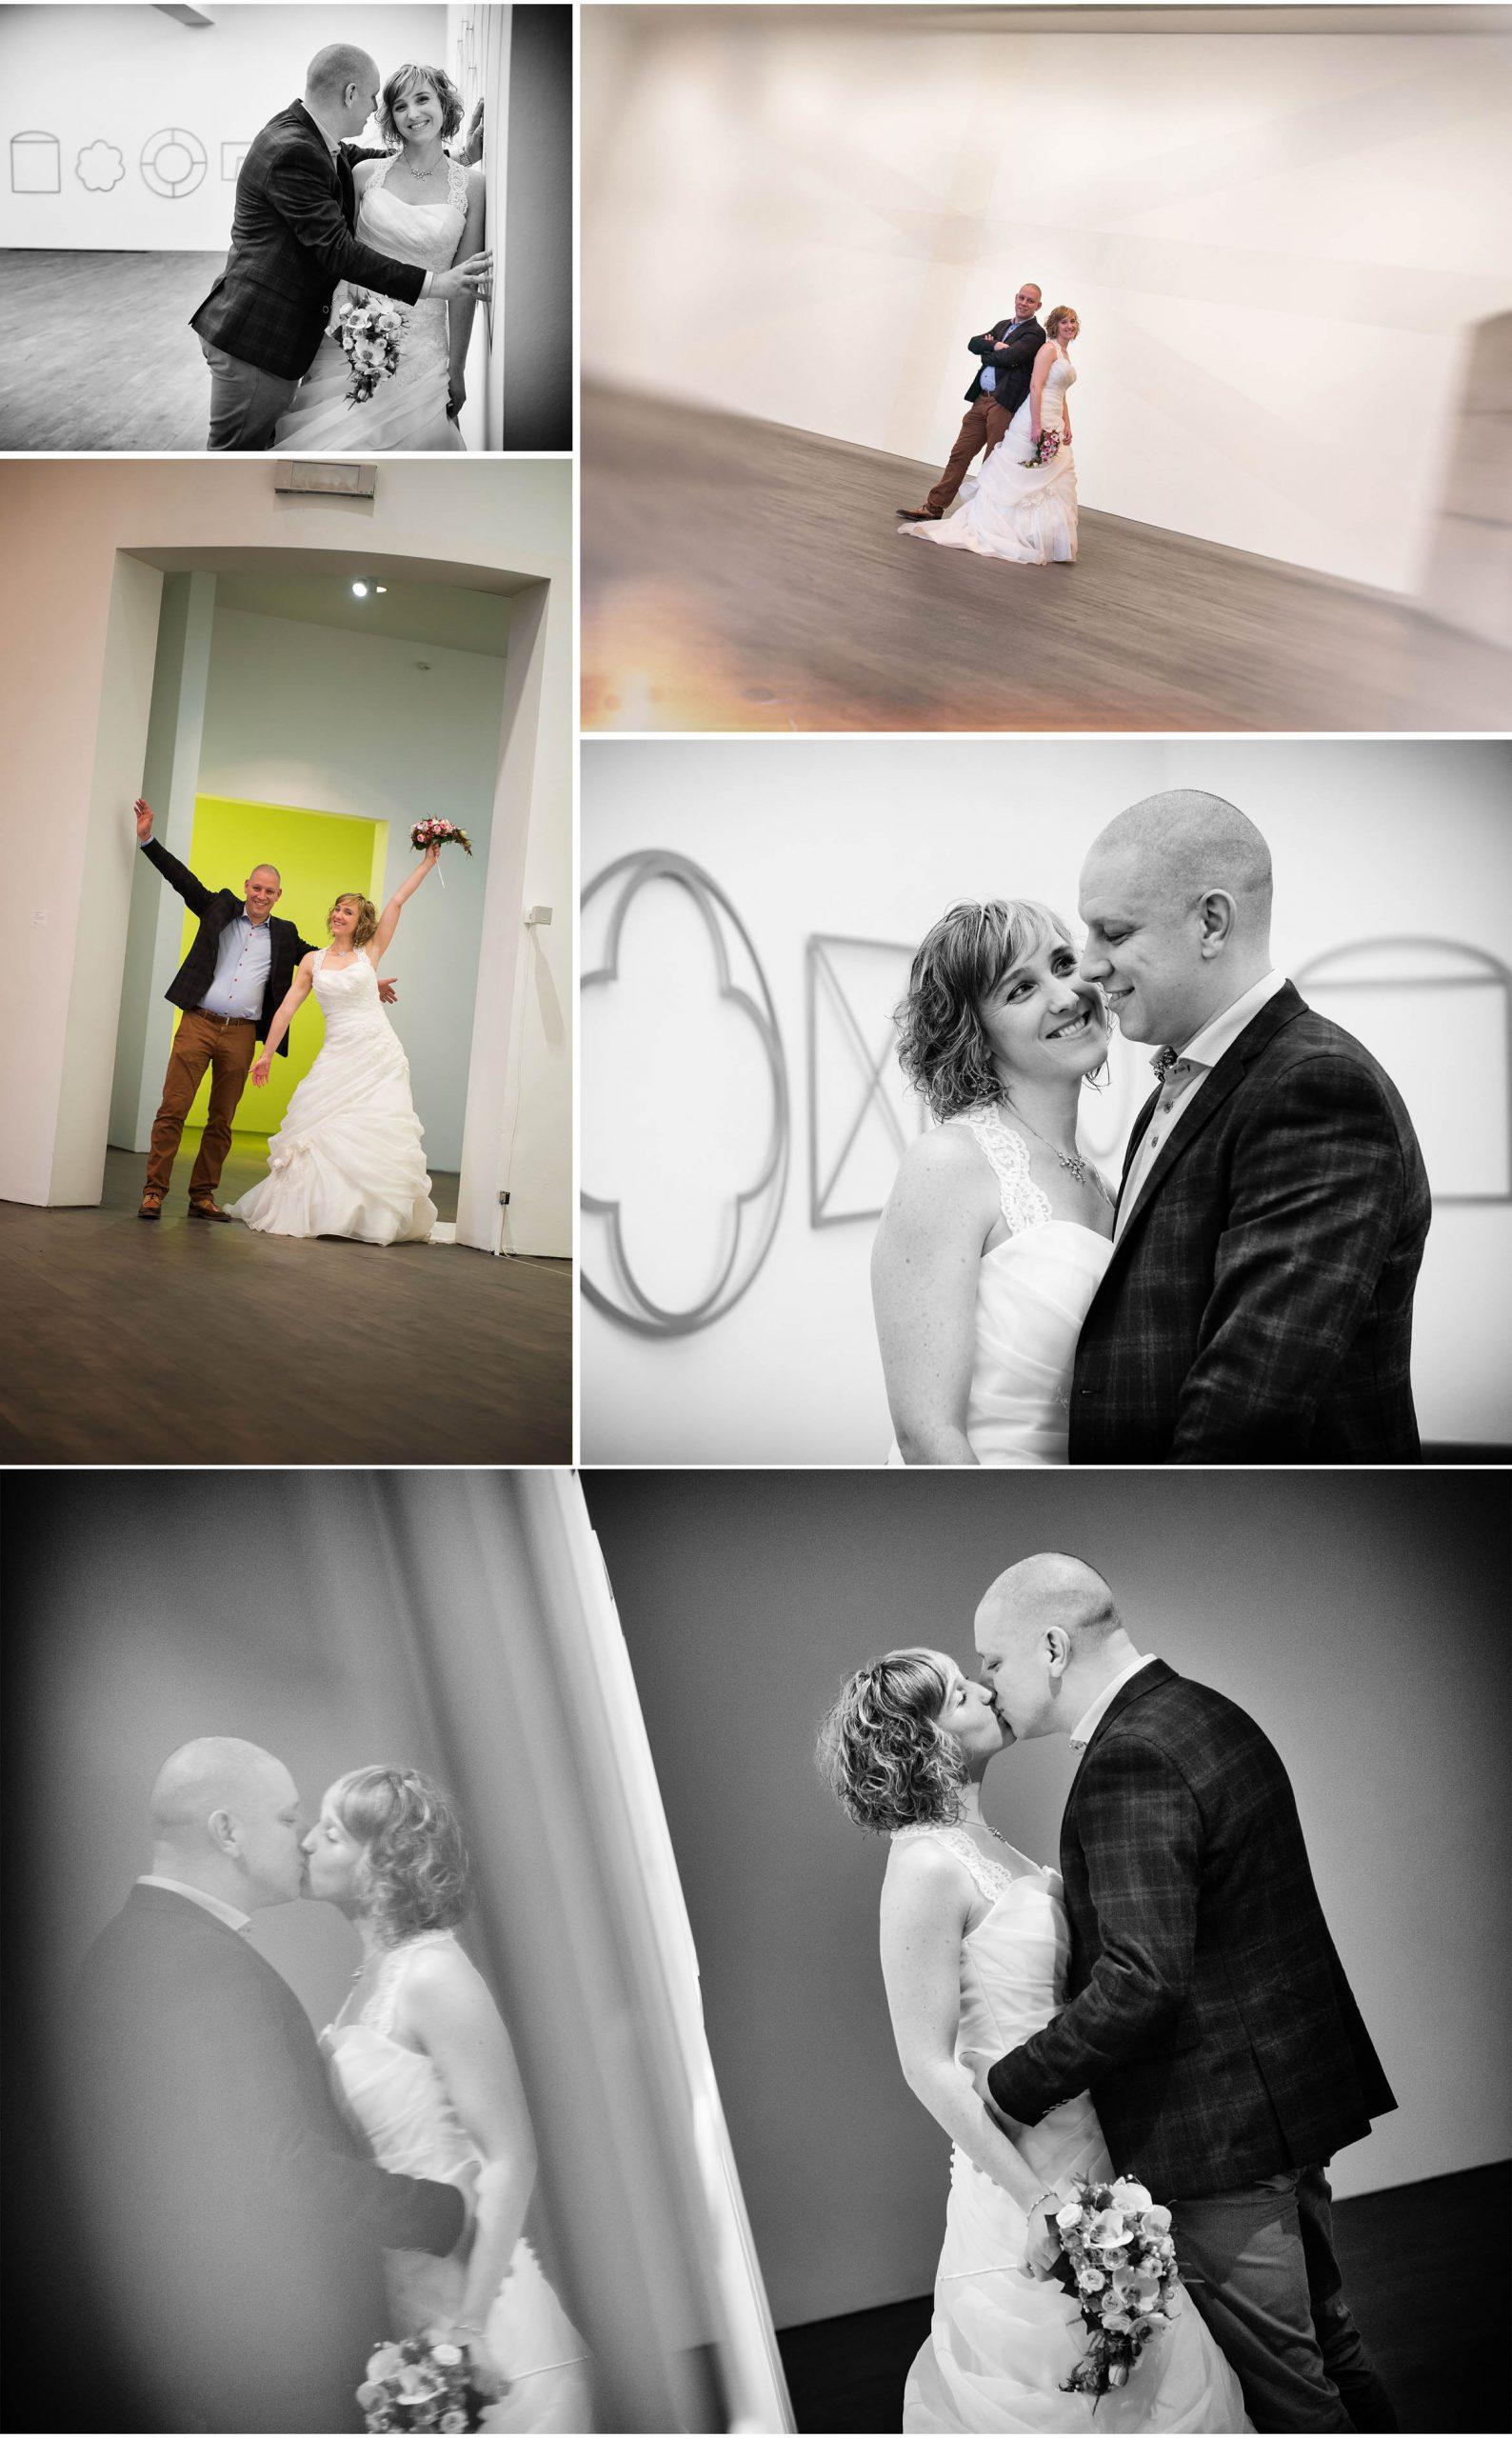 huwelijksfotograaf Meetkerke